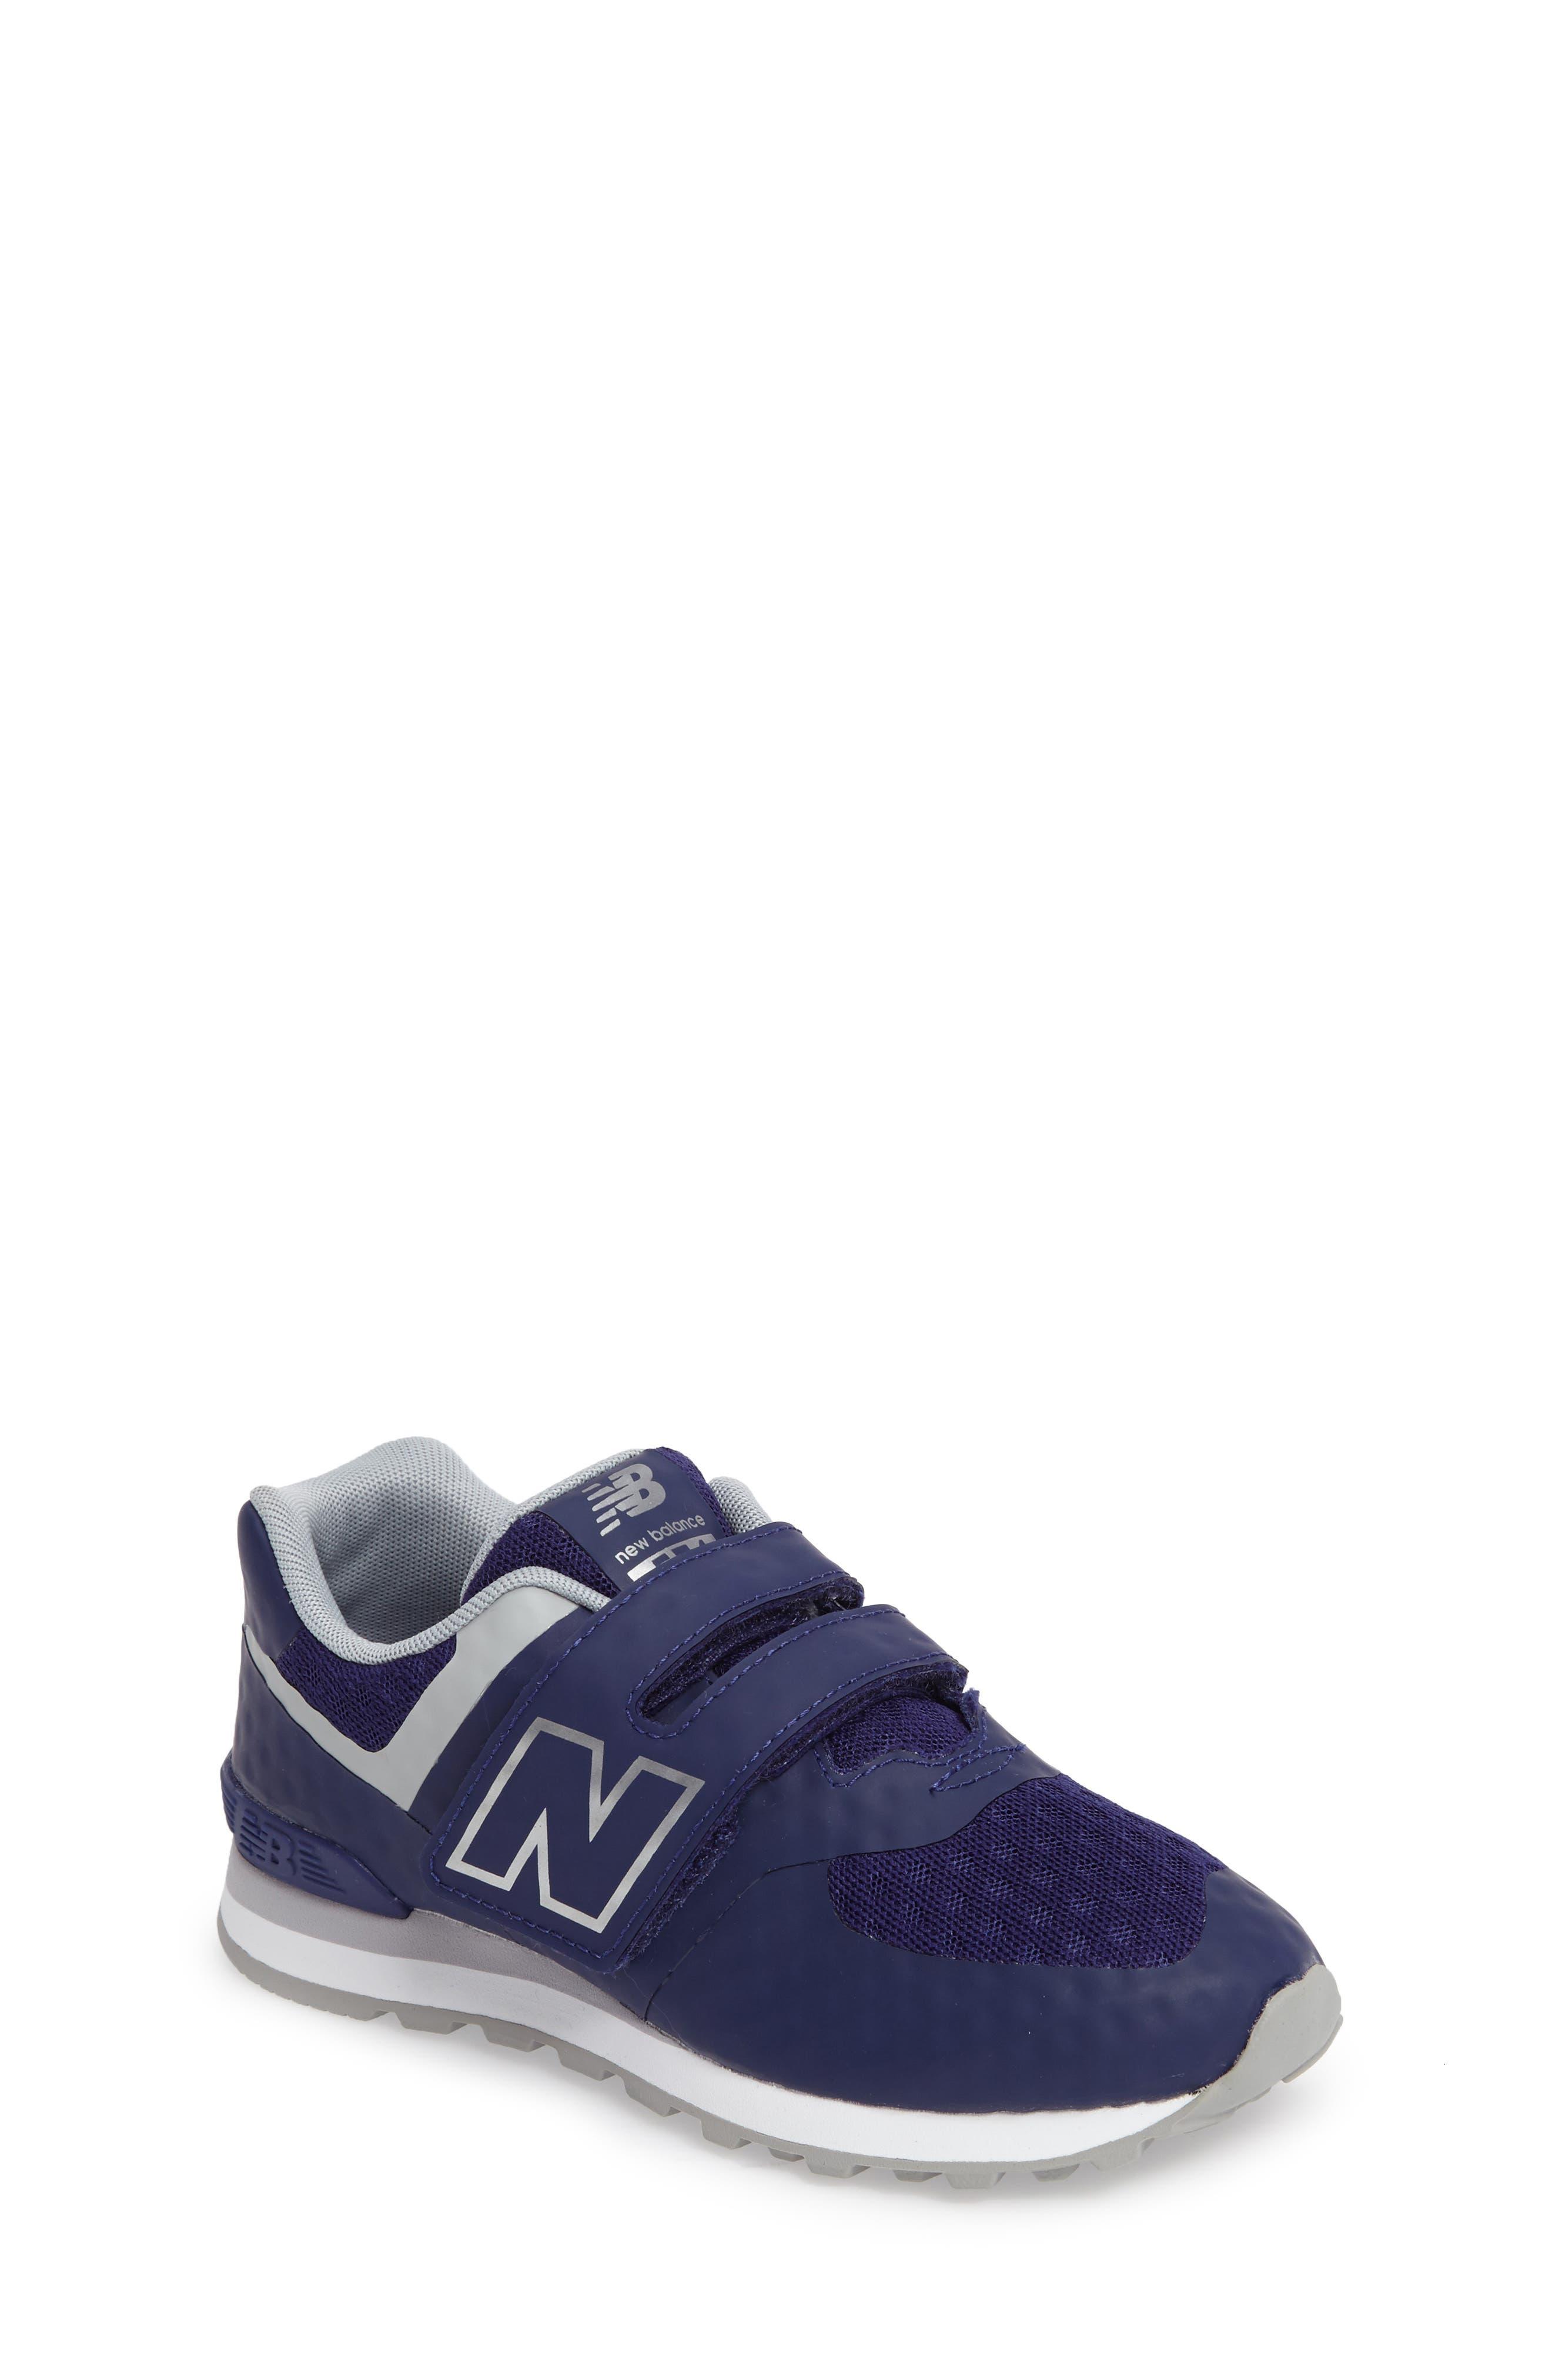 New Balance 574 Kids Only Sneaker (Baby, Walker, Toddler, Little Kid & Big Kid)